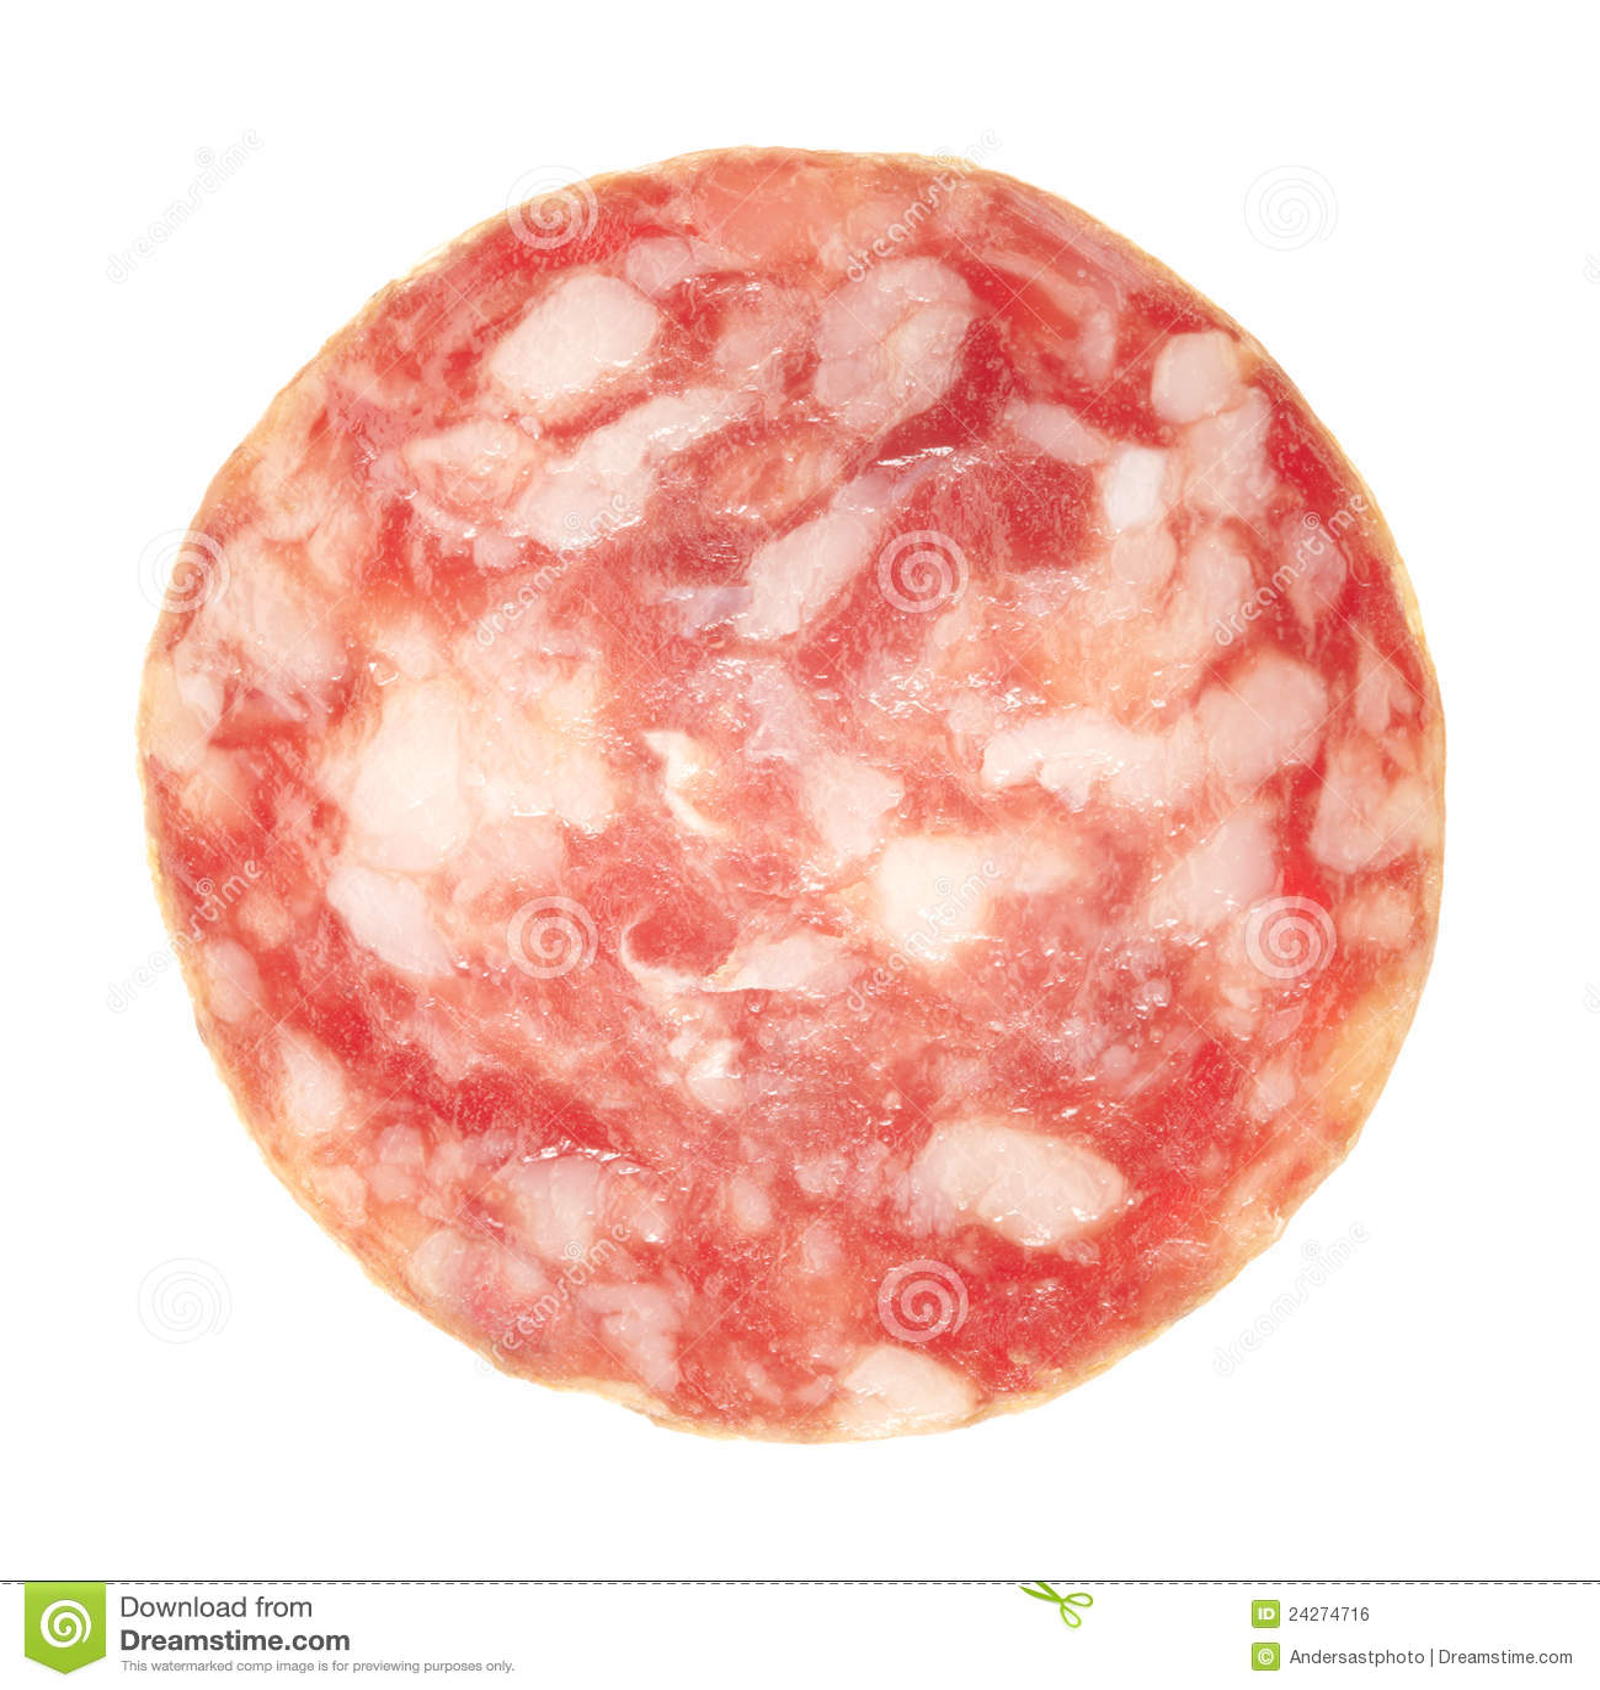 Salami Slices Stock Photos & Salami Slices Stock Images ...